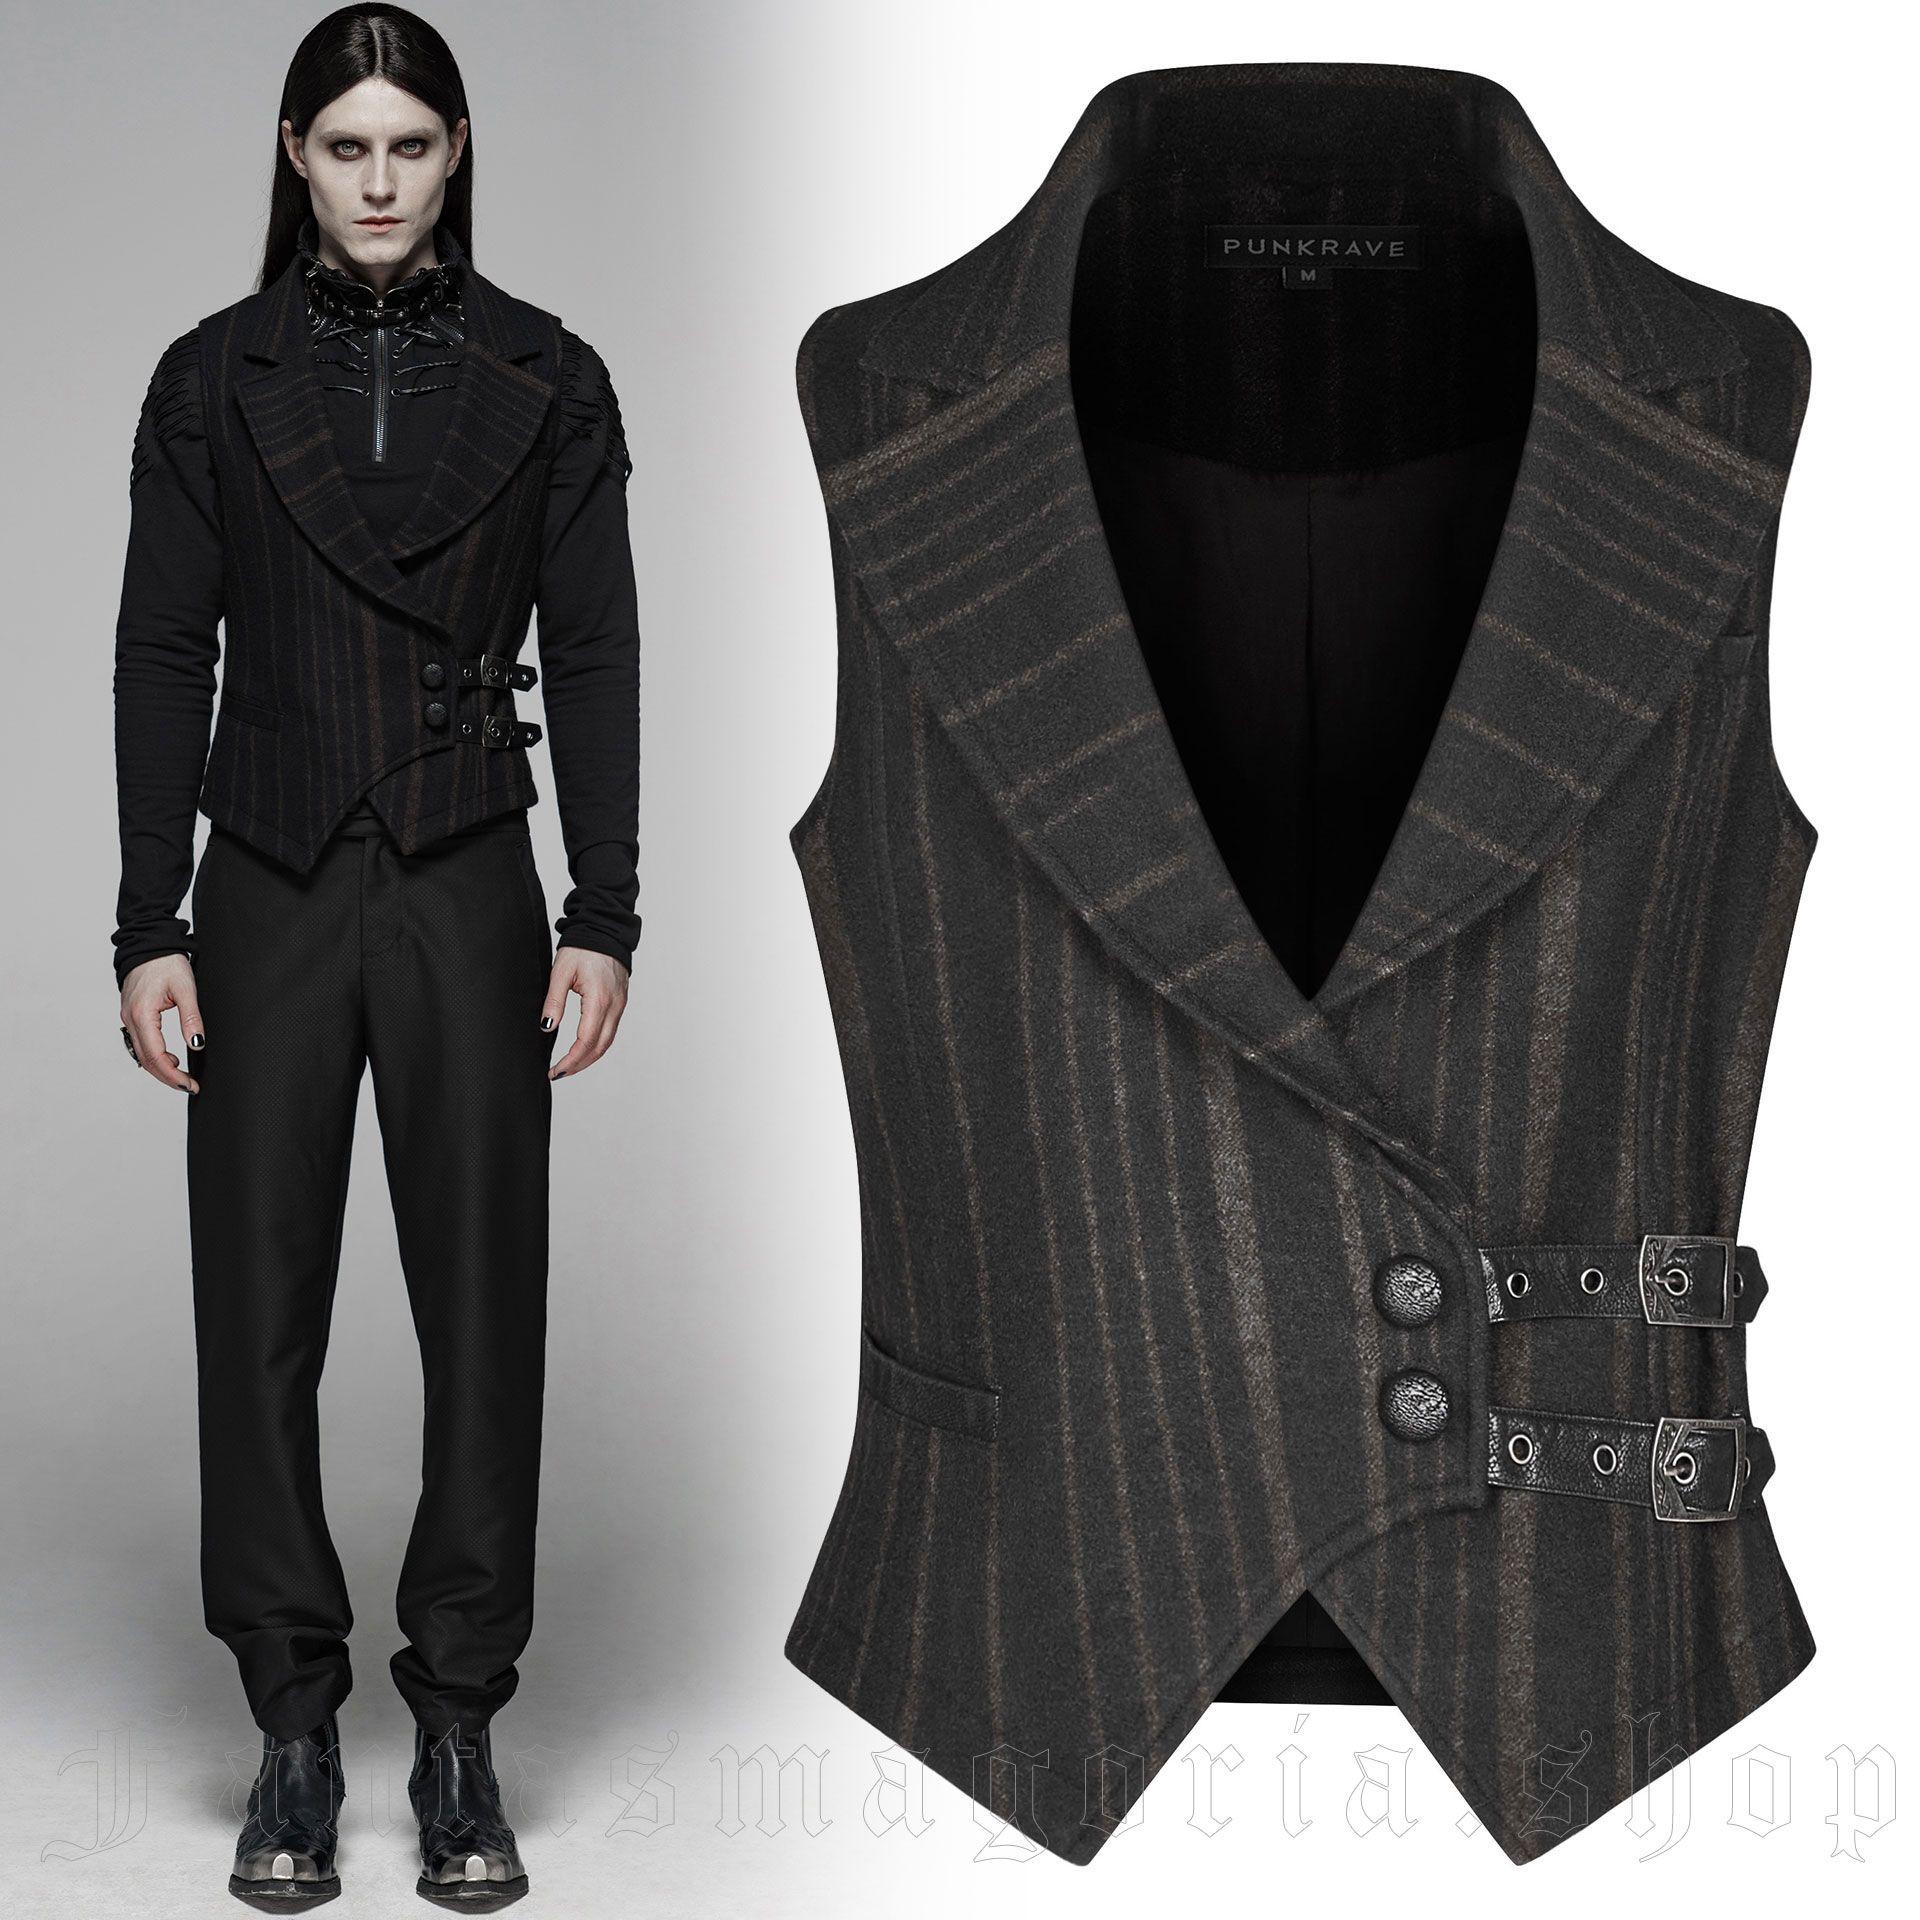 men's Vulkan Vest by PUNK RAVE brand, code: WY-1093/BK-CO